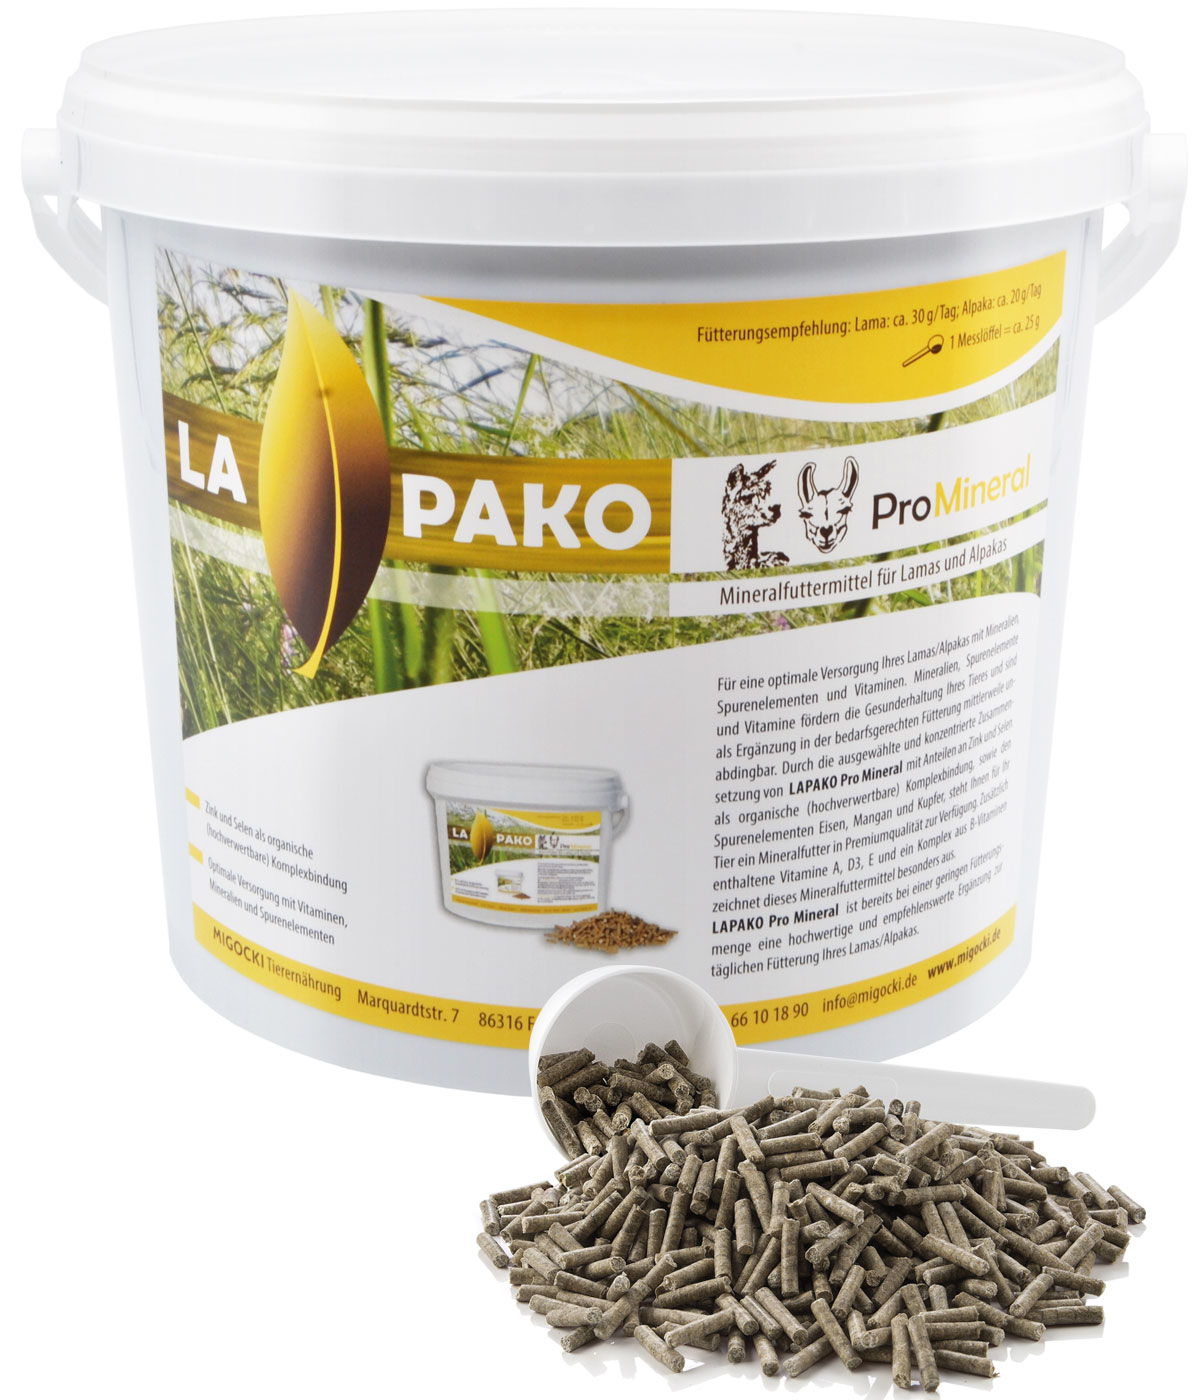 Produkt Lapako Pro Mineral Alpaka pelletiert